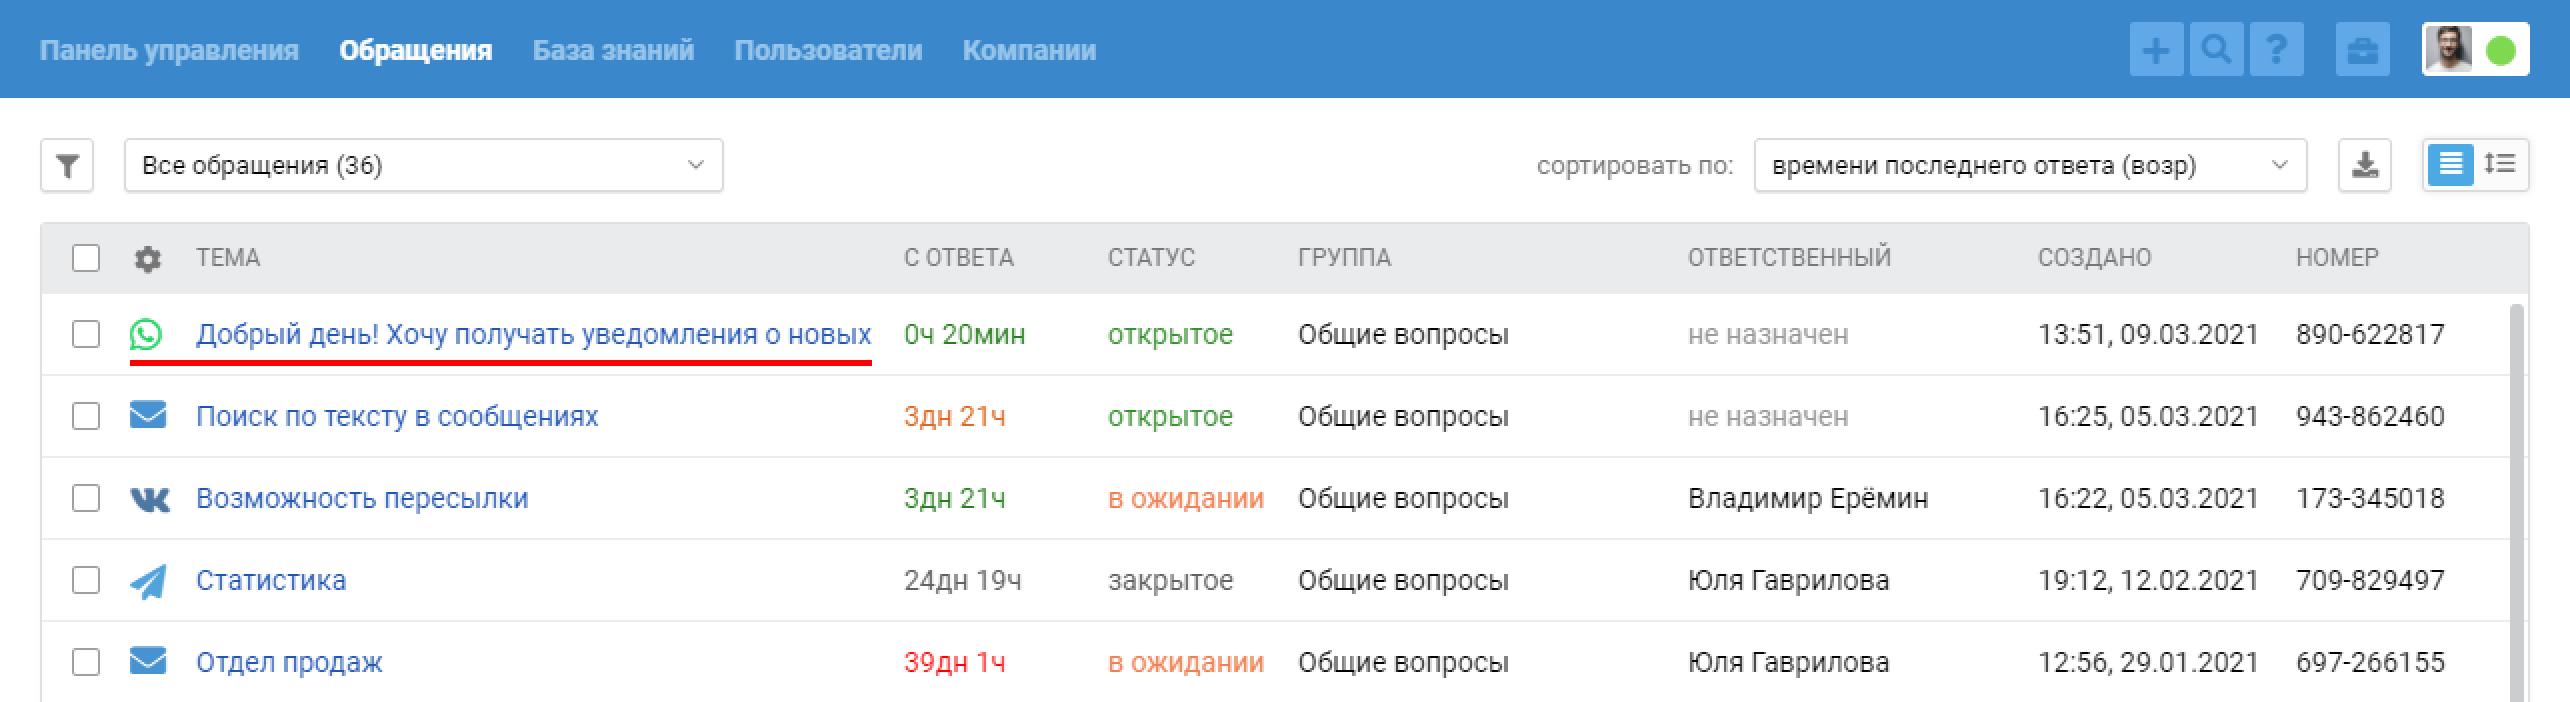 https://138018.selcdn.ru/KB_images/omnideskru/1/180702/8ce2082415a5528c9255d6768b528a5e.png